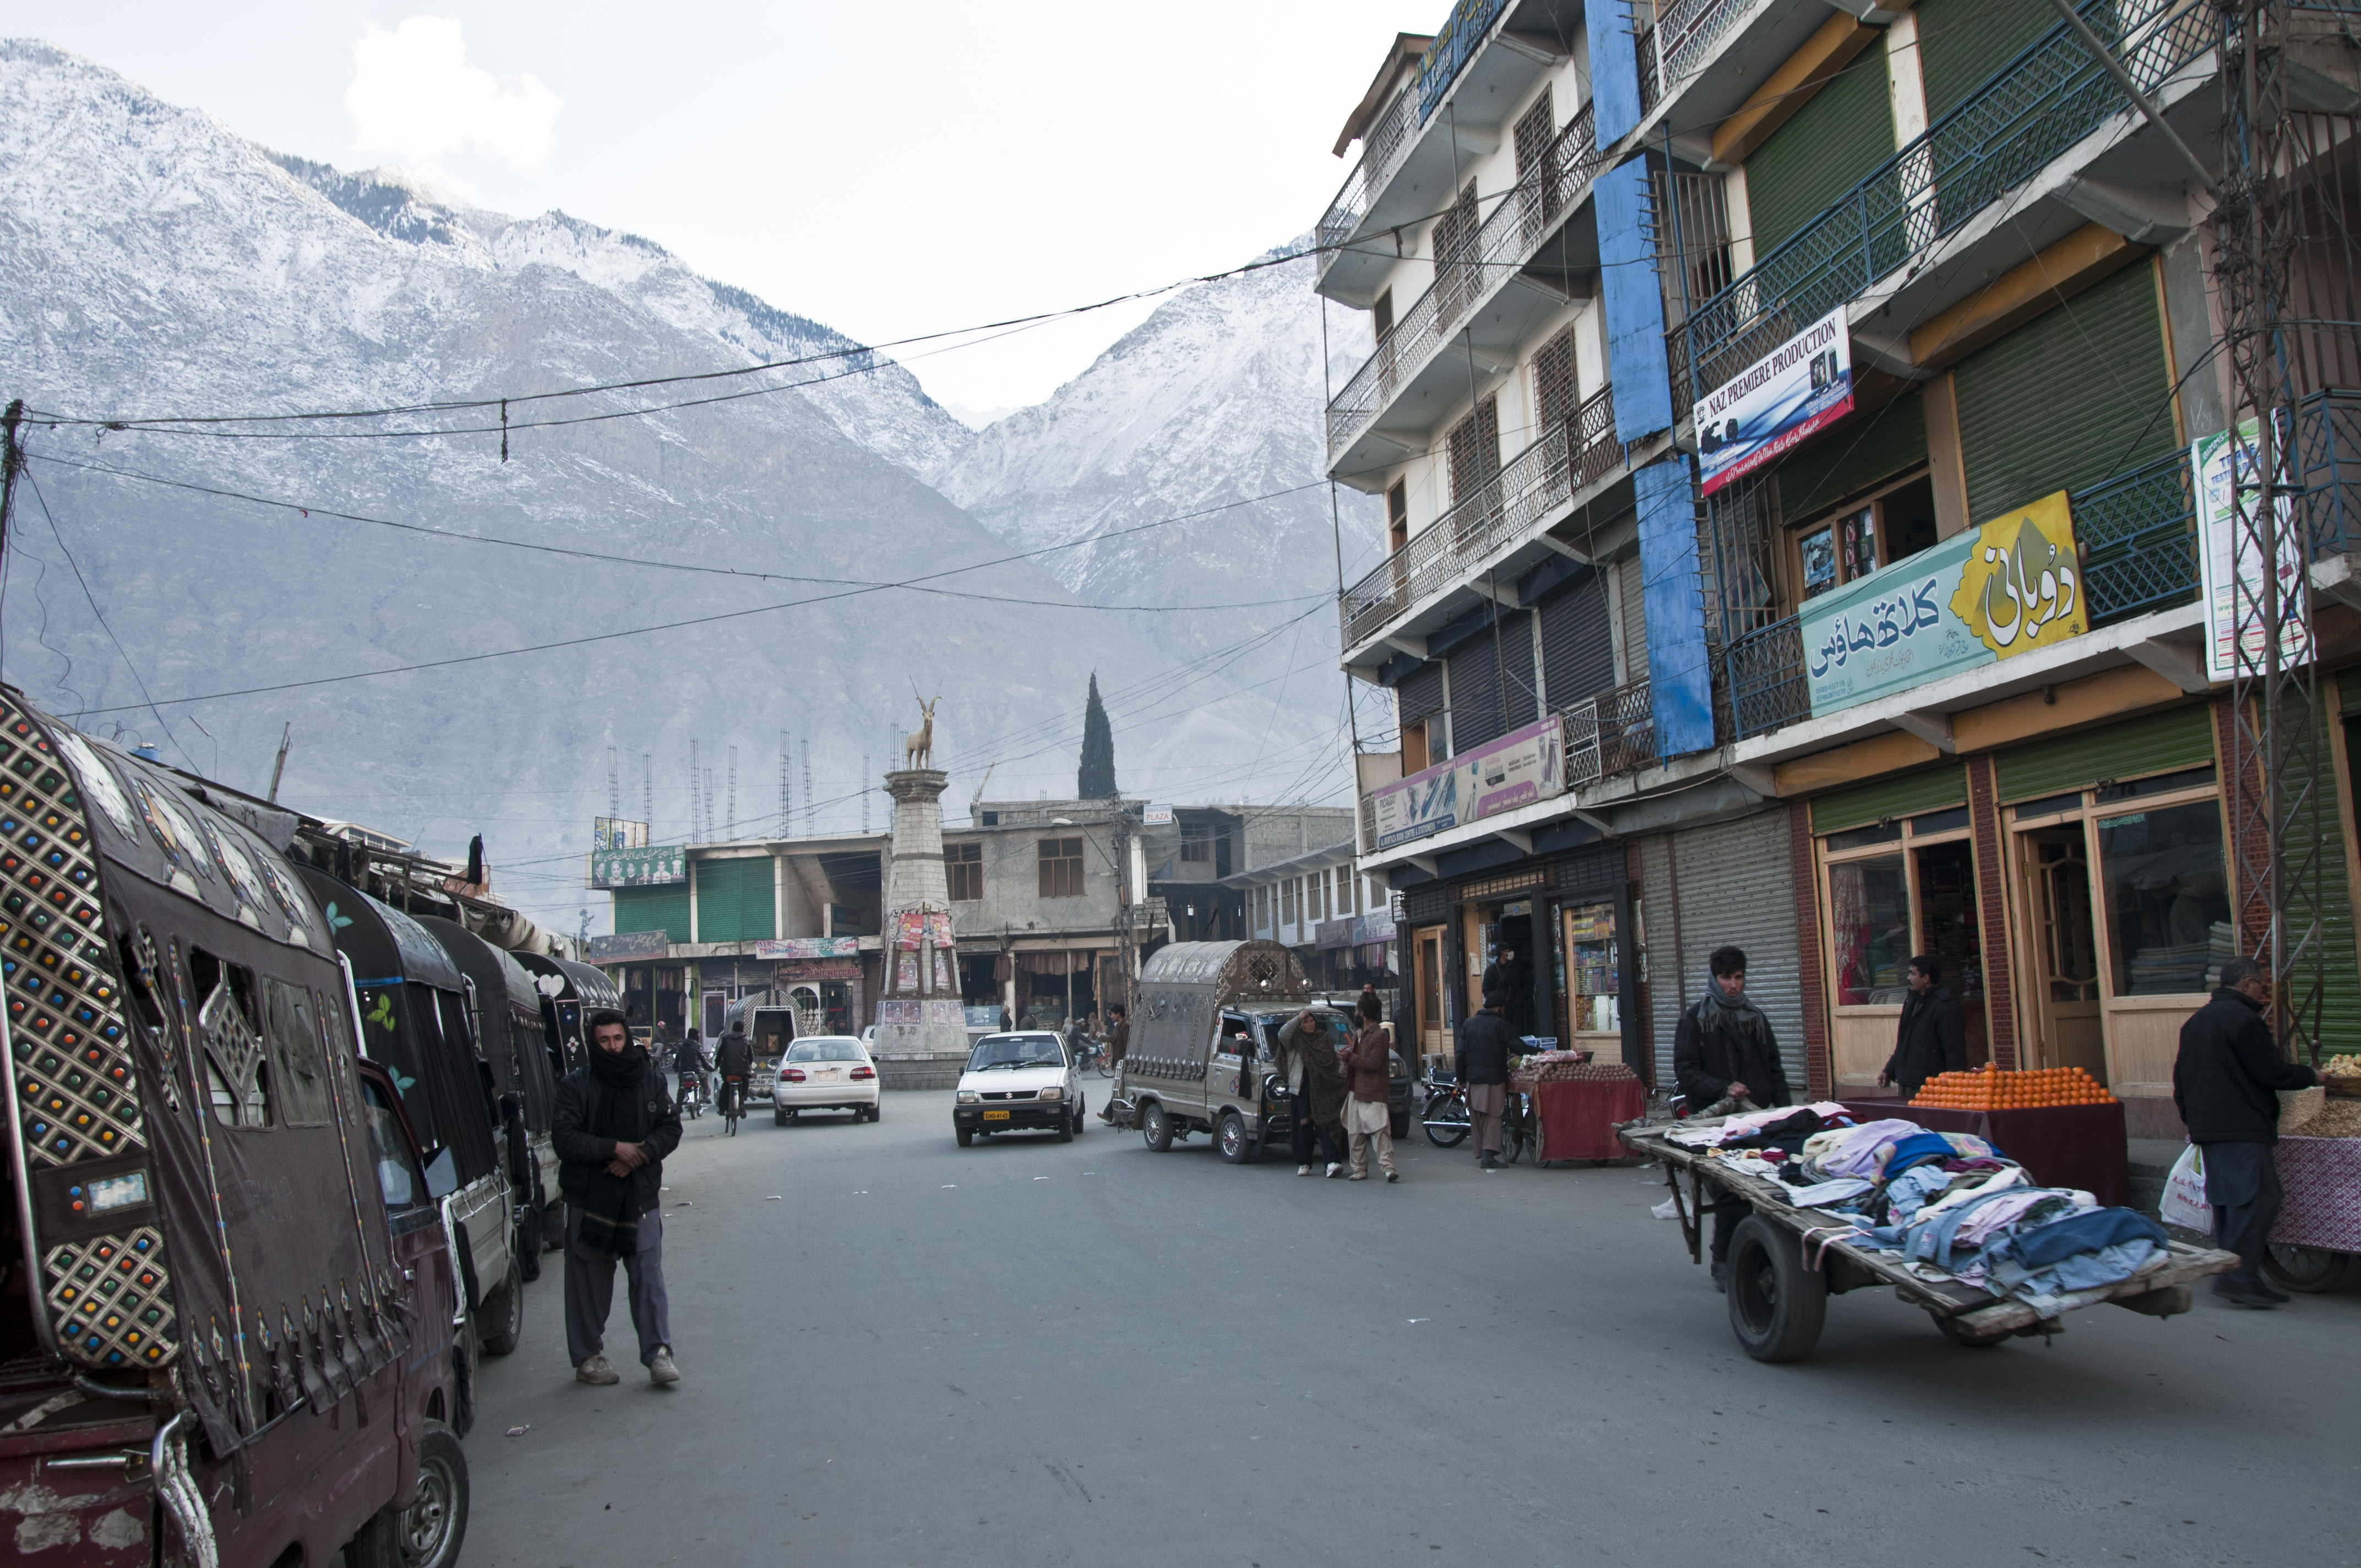 File:Gilgit Northern Pakistan jpg - Wikimedia Commons